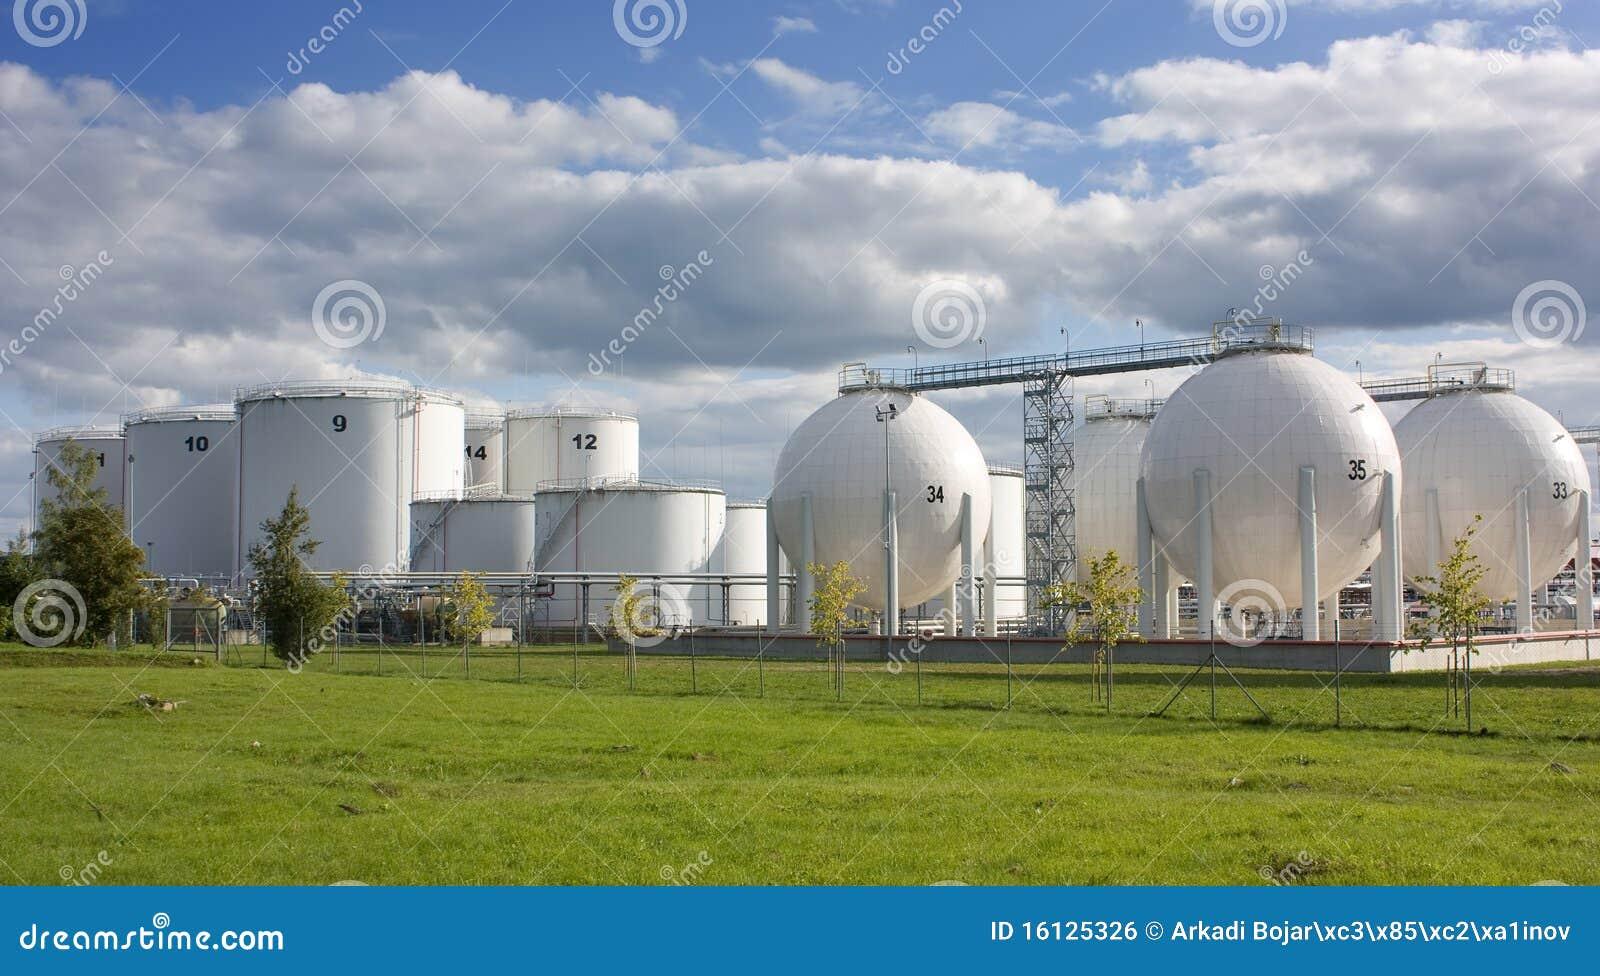 Tanques de armazenamento do petróleo